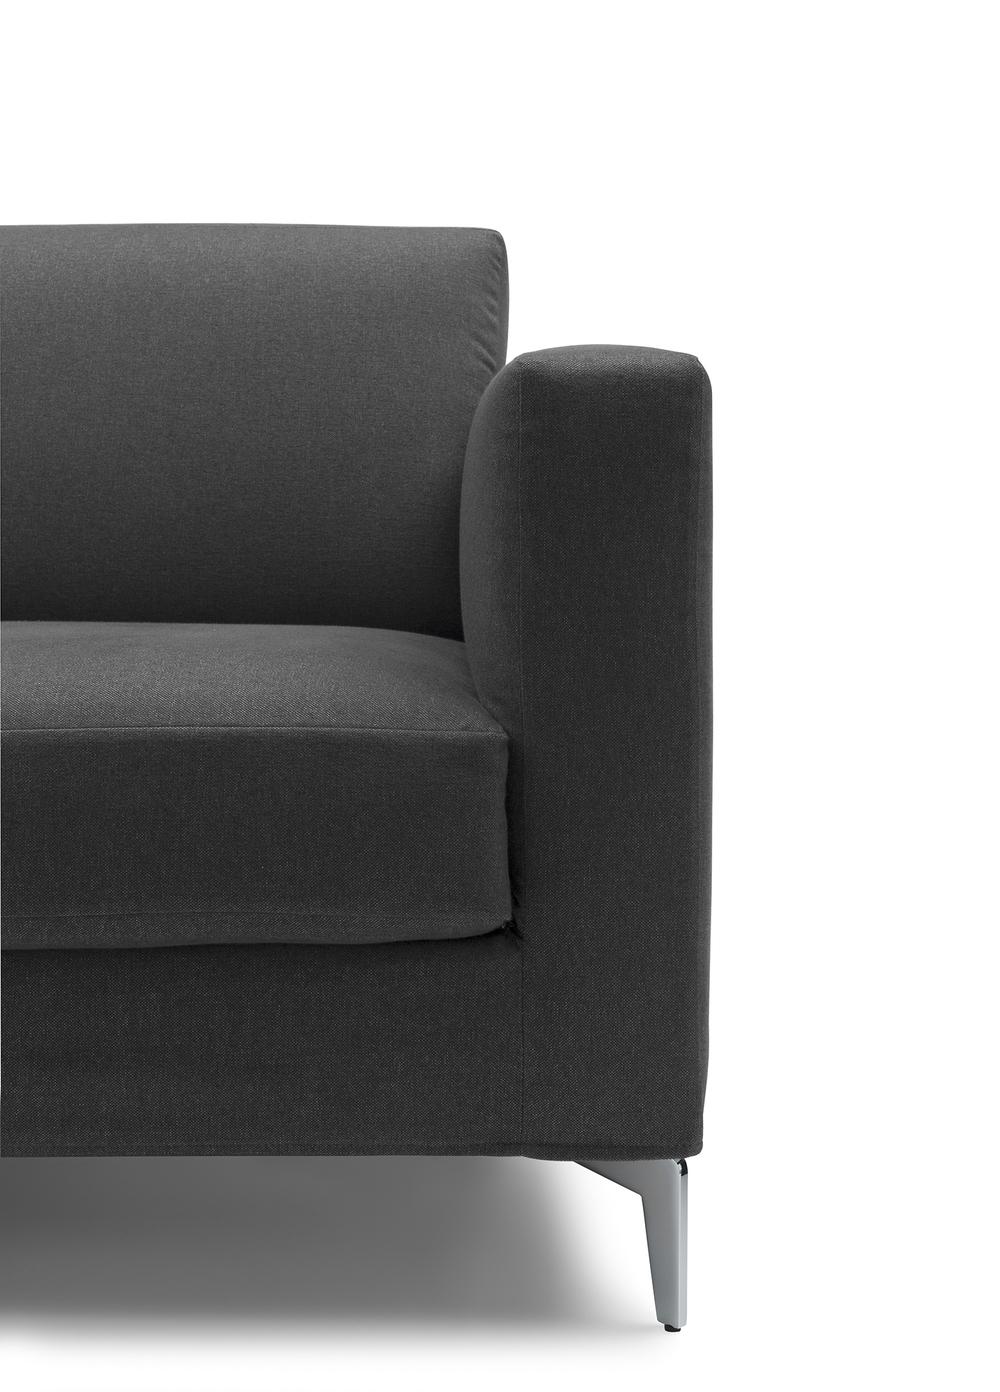 SB 87 Modern Sofa Bed